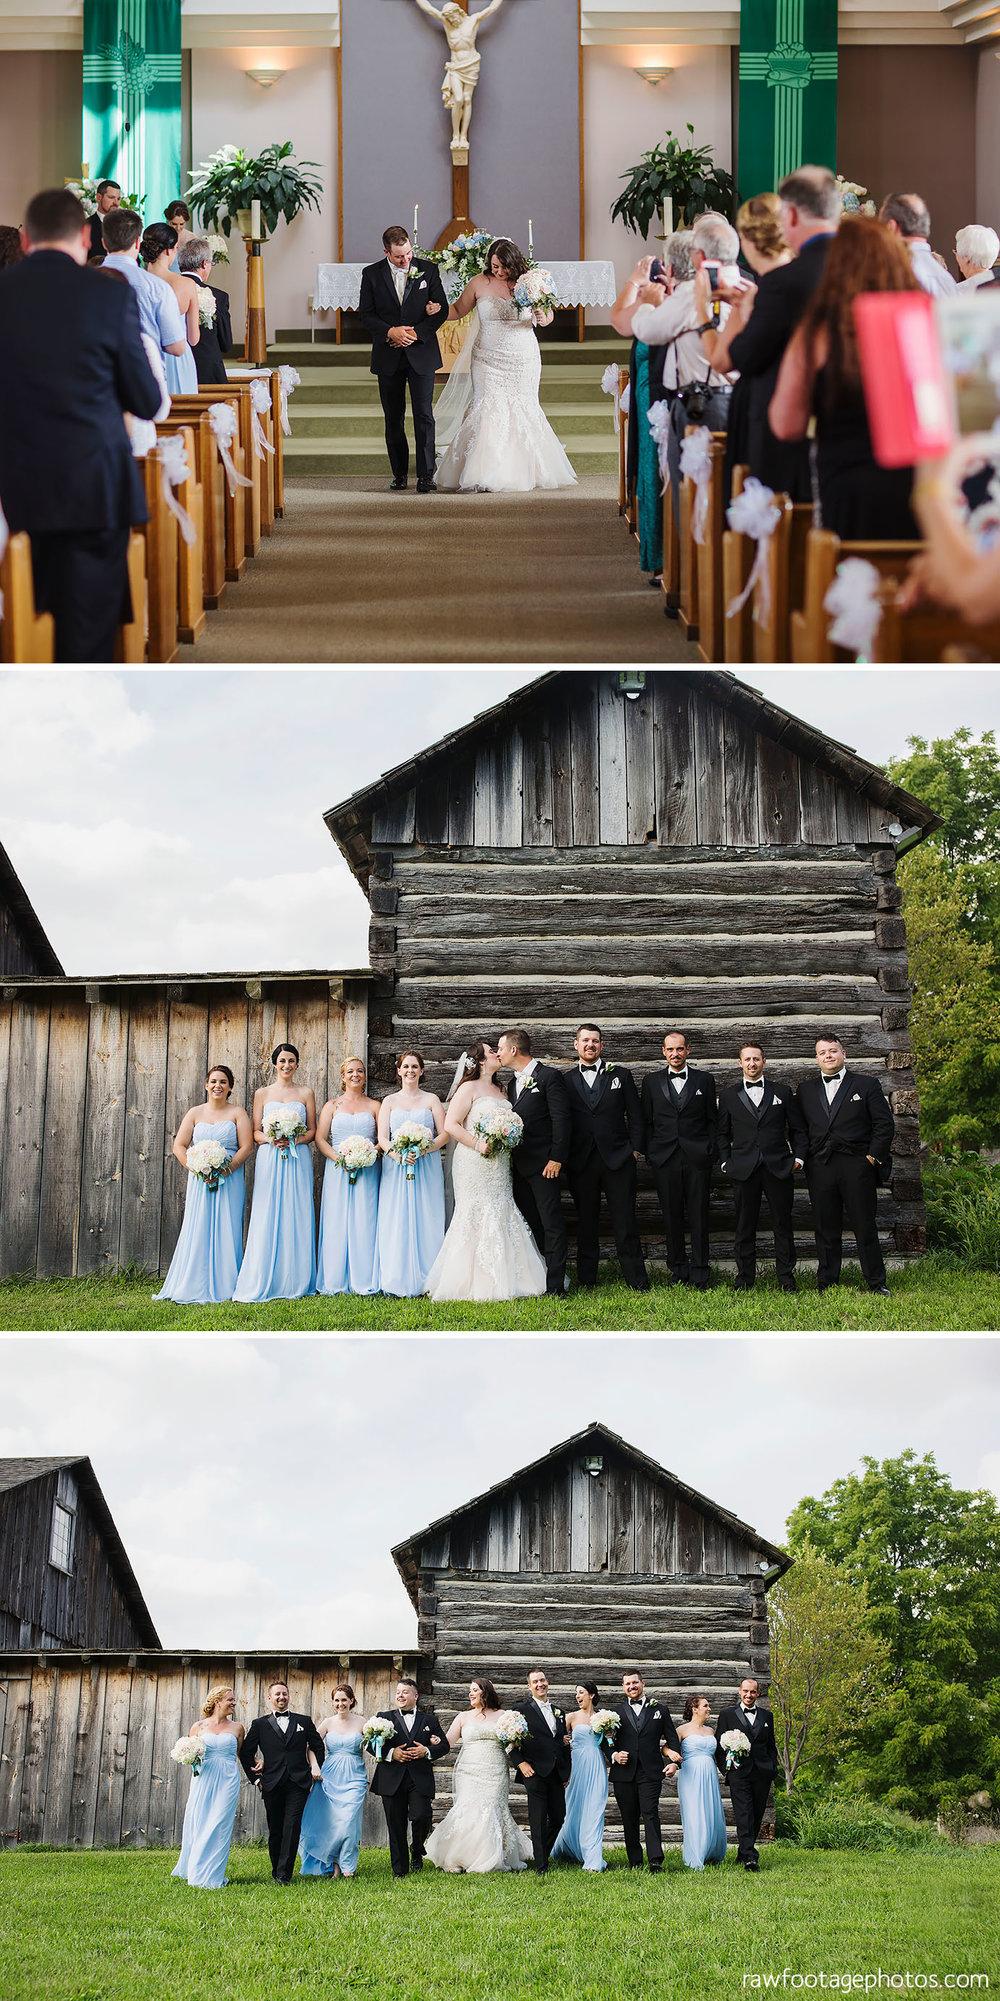 Holy Cross parish Ceremony | Fanshawe Pioneer Village Wedding Portraits